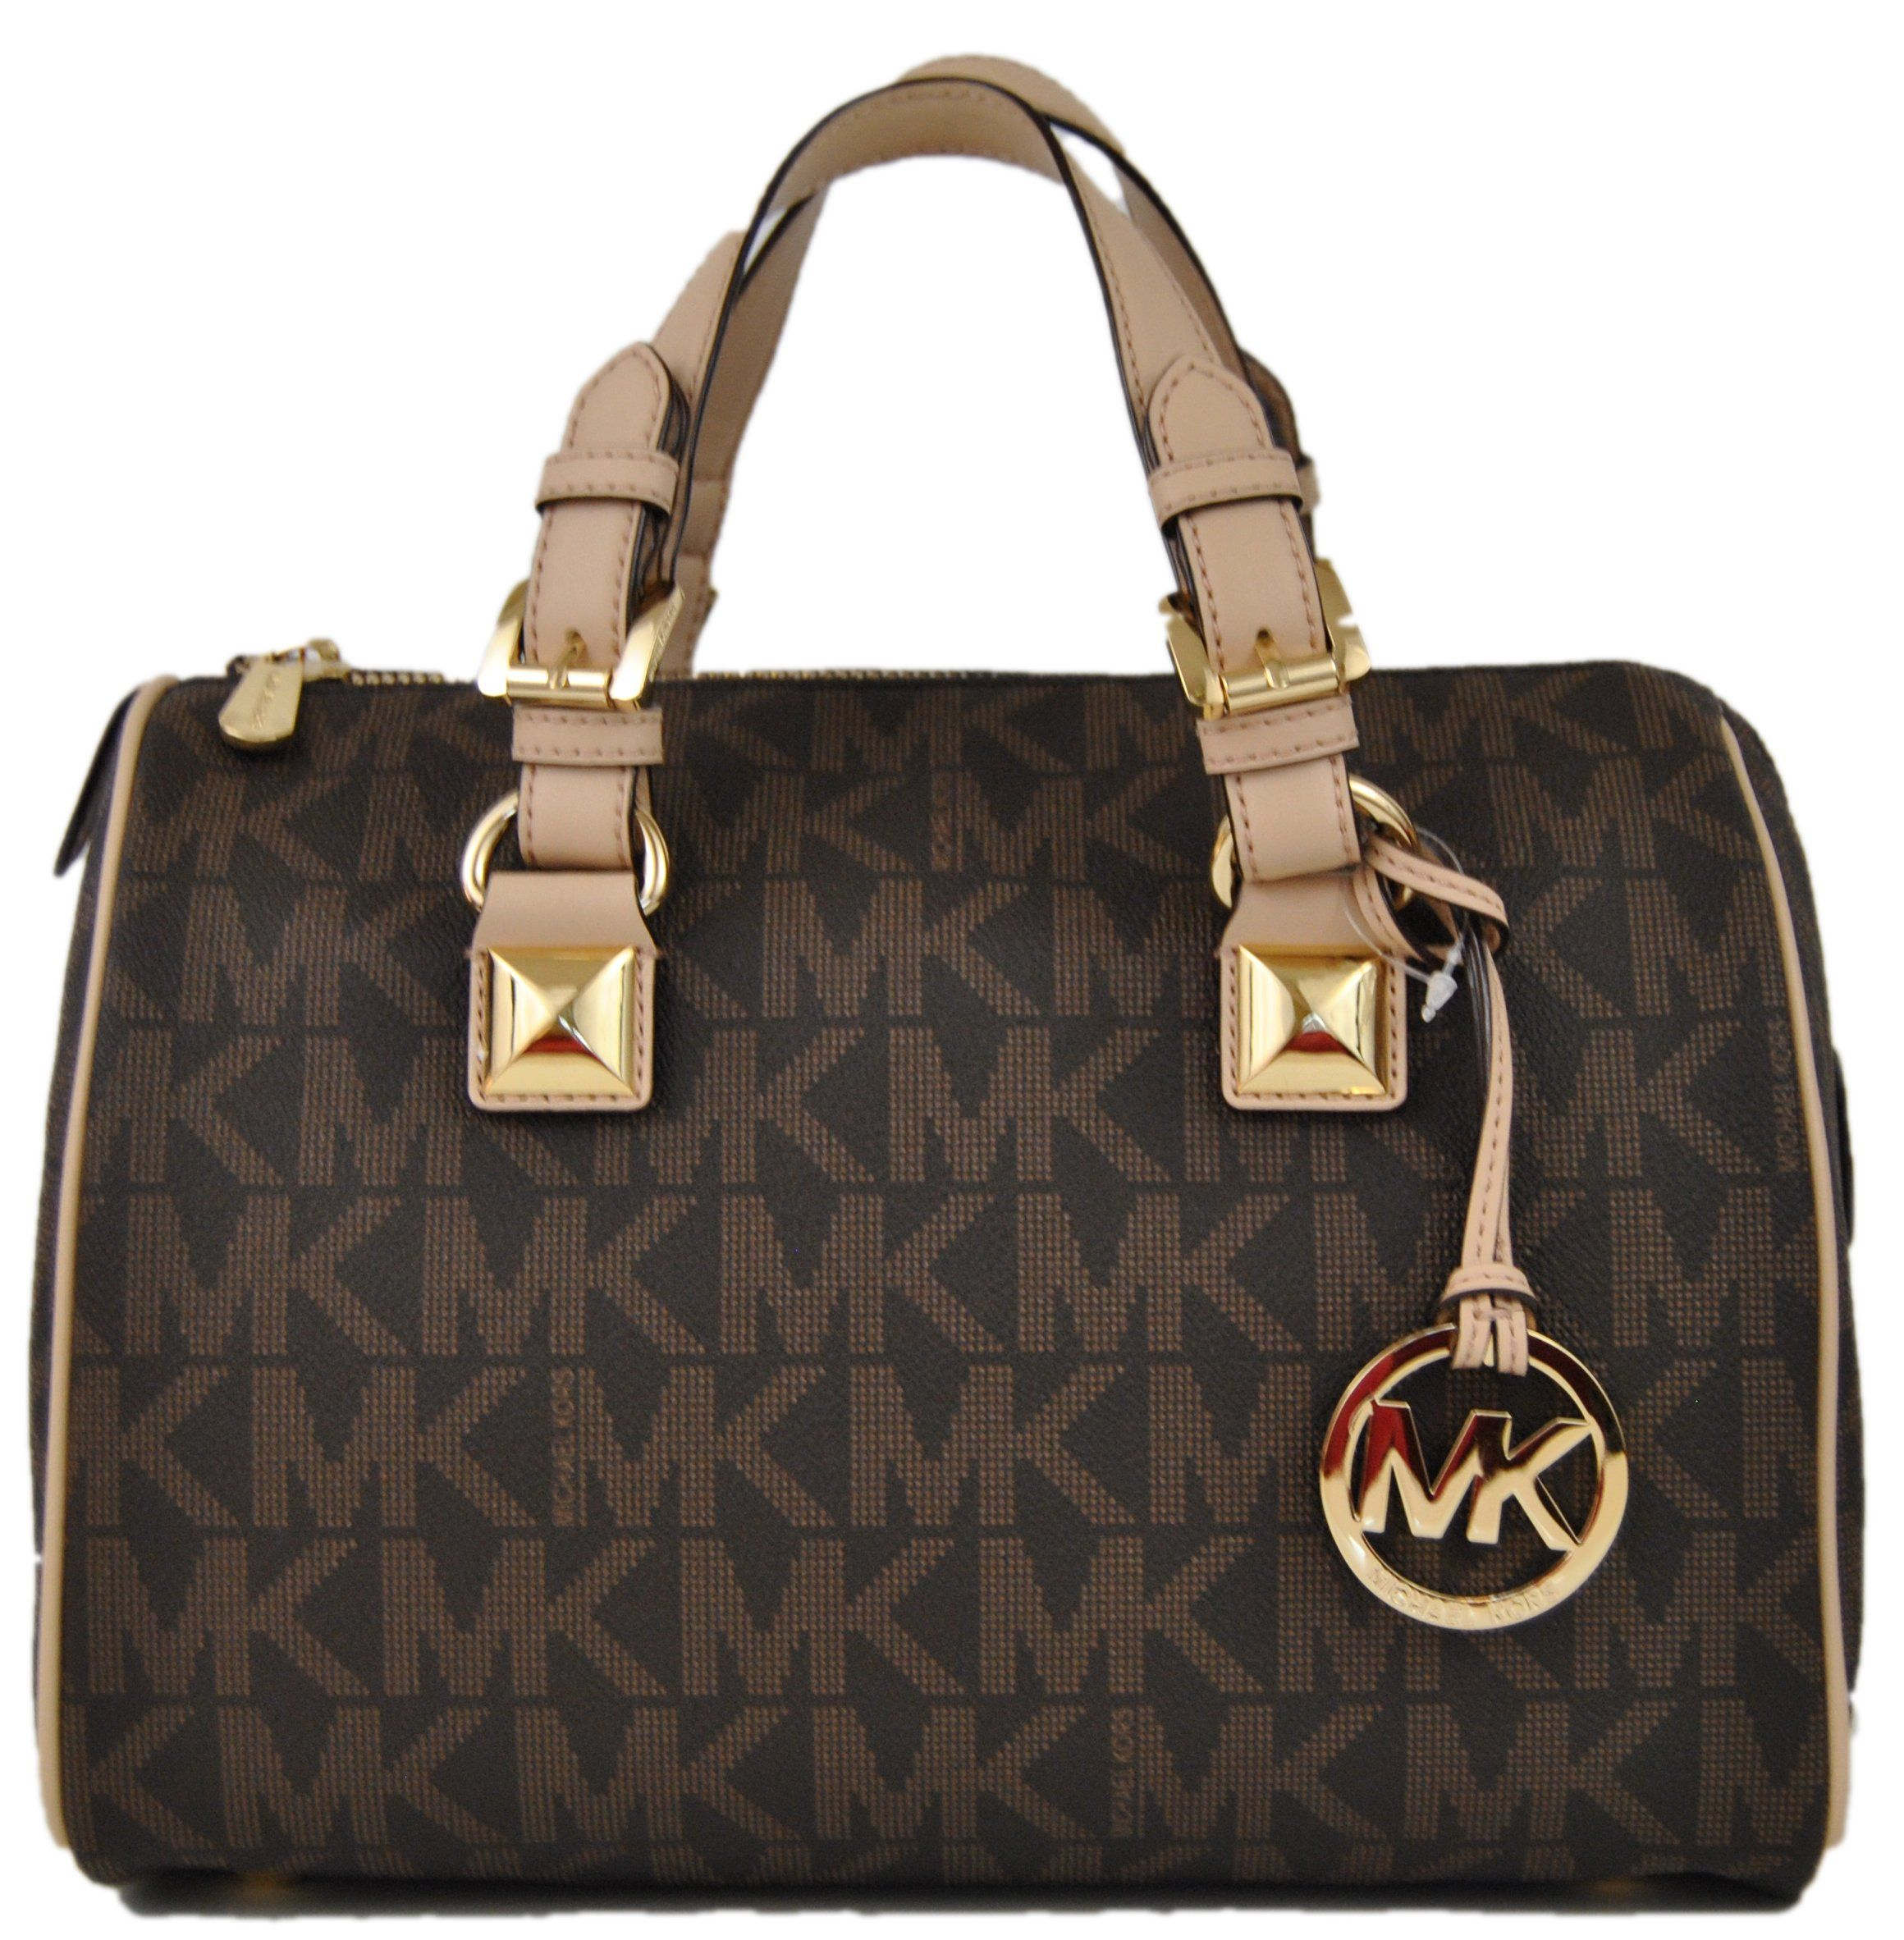 Michael Kors Grayson Medium Satchel Signature Brown PVC: Handbags:  Amazon.com